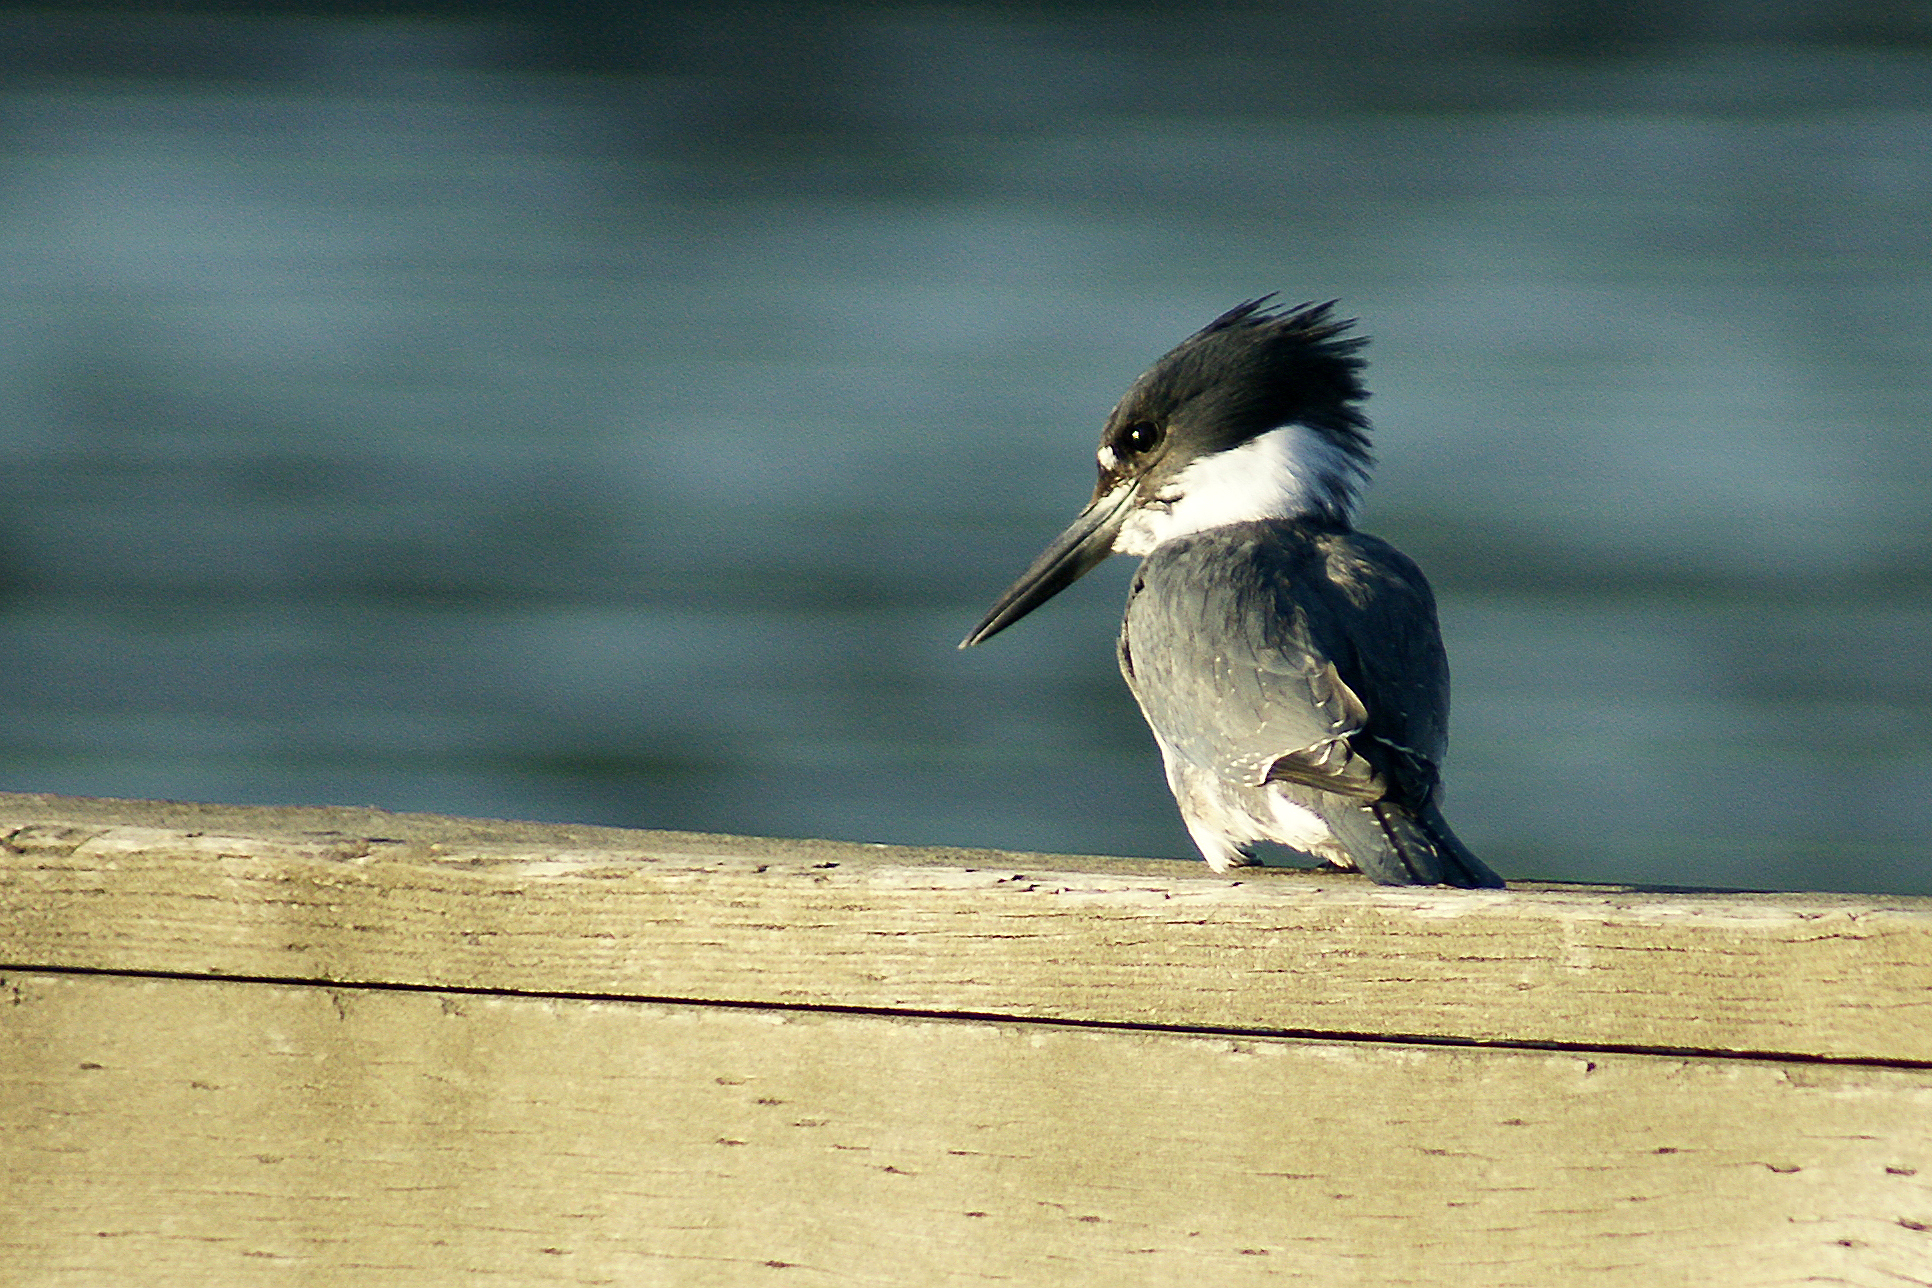 kingfisherDSC06843.jpg